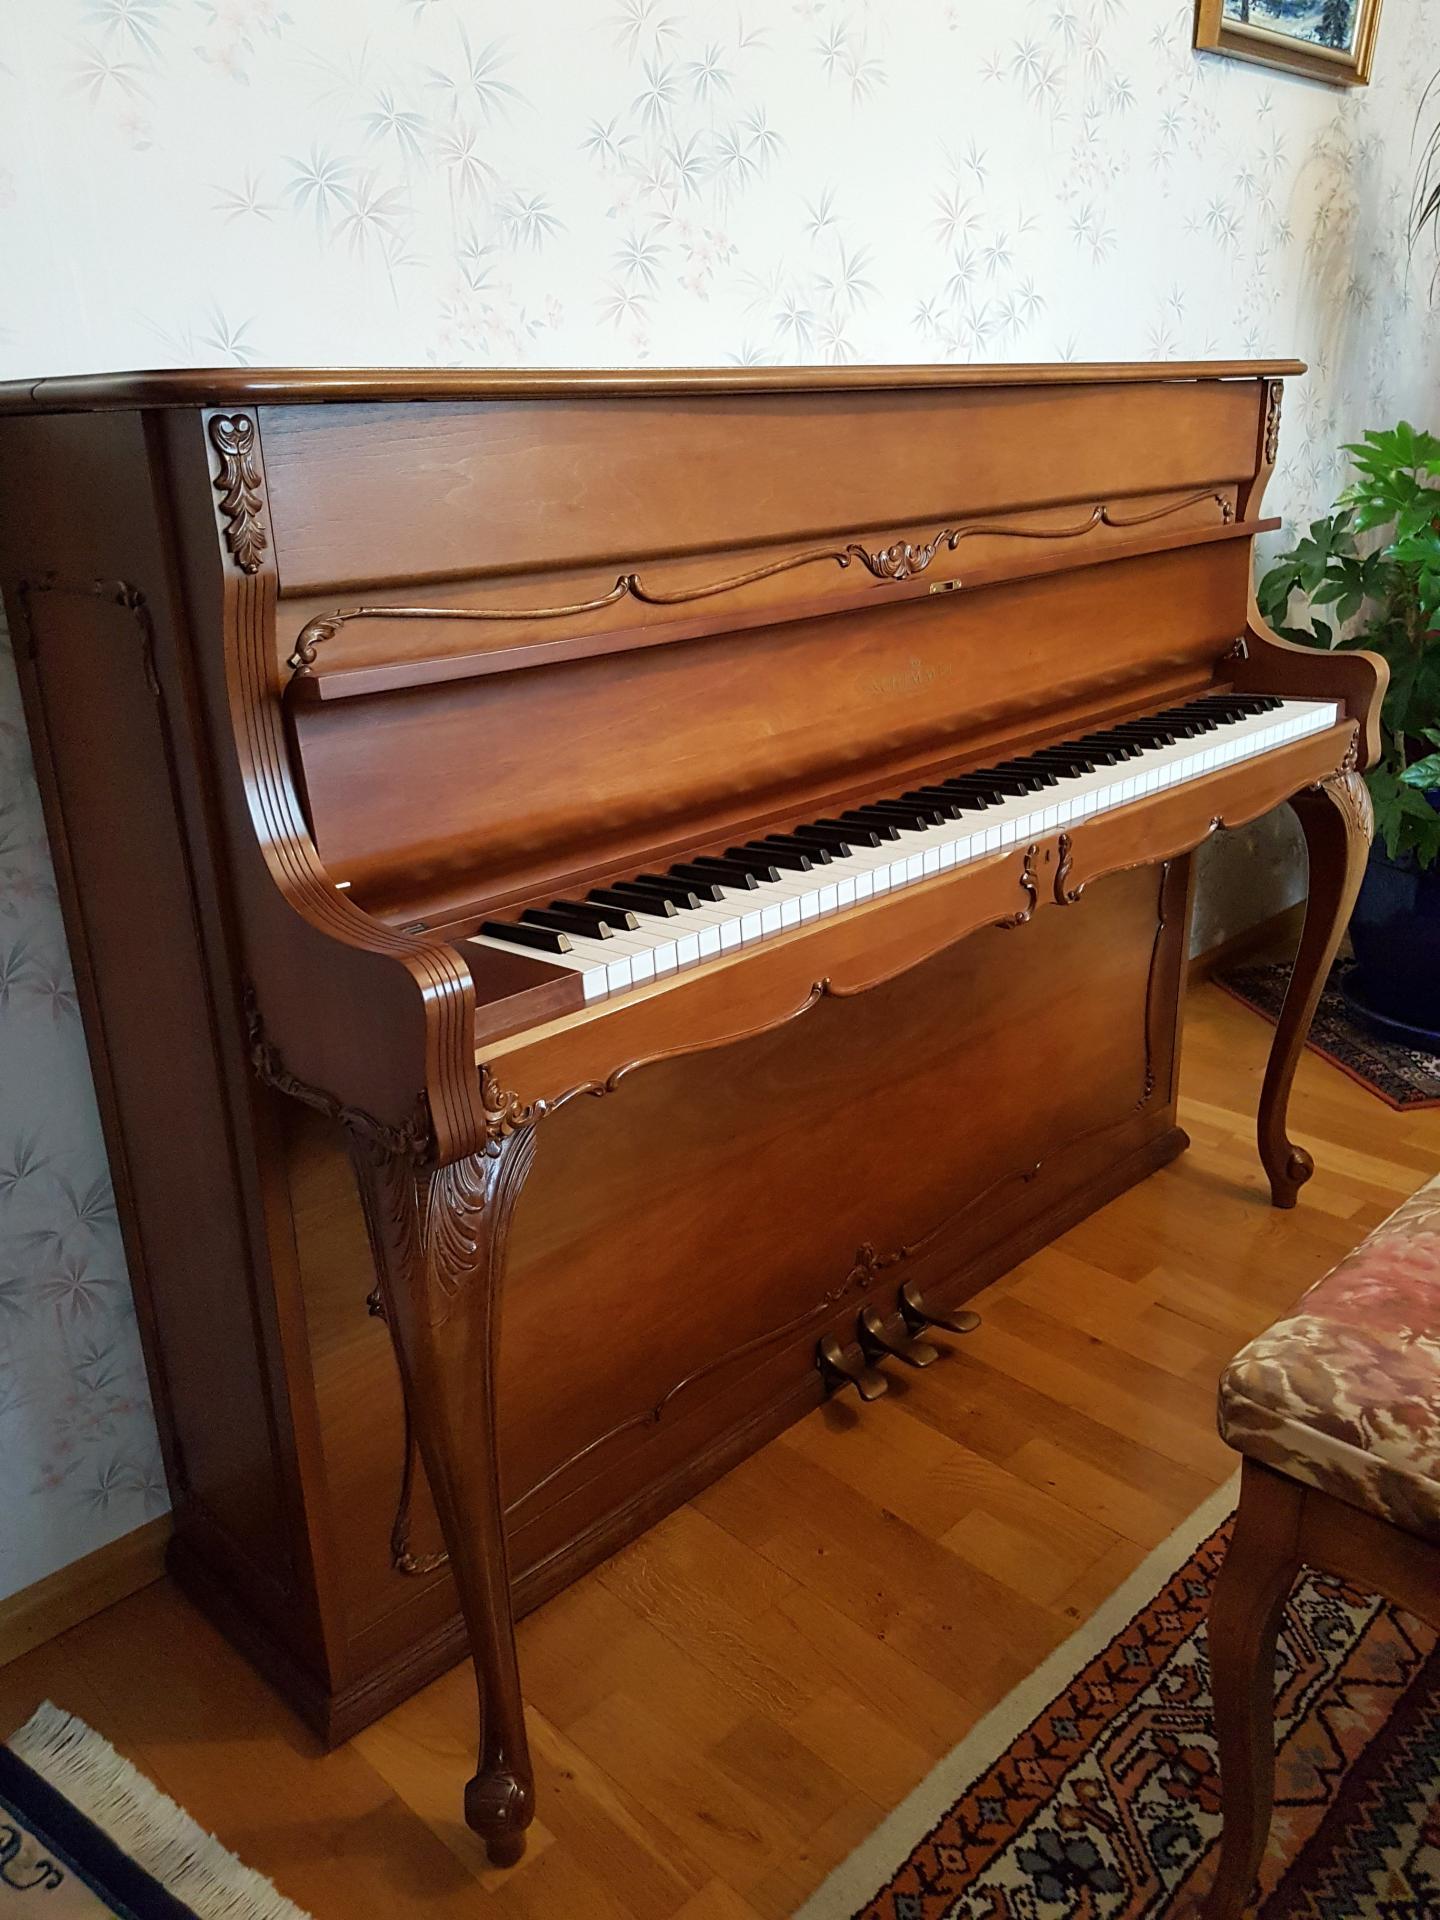 schimmel piano droit d 39 occasion louis xv baroque. Black Bedroom Furniture Sets. Home Design Ideas